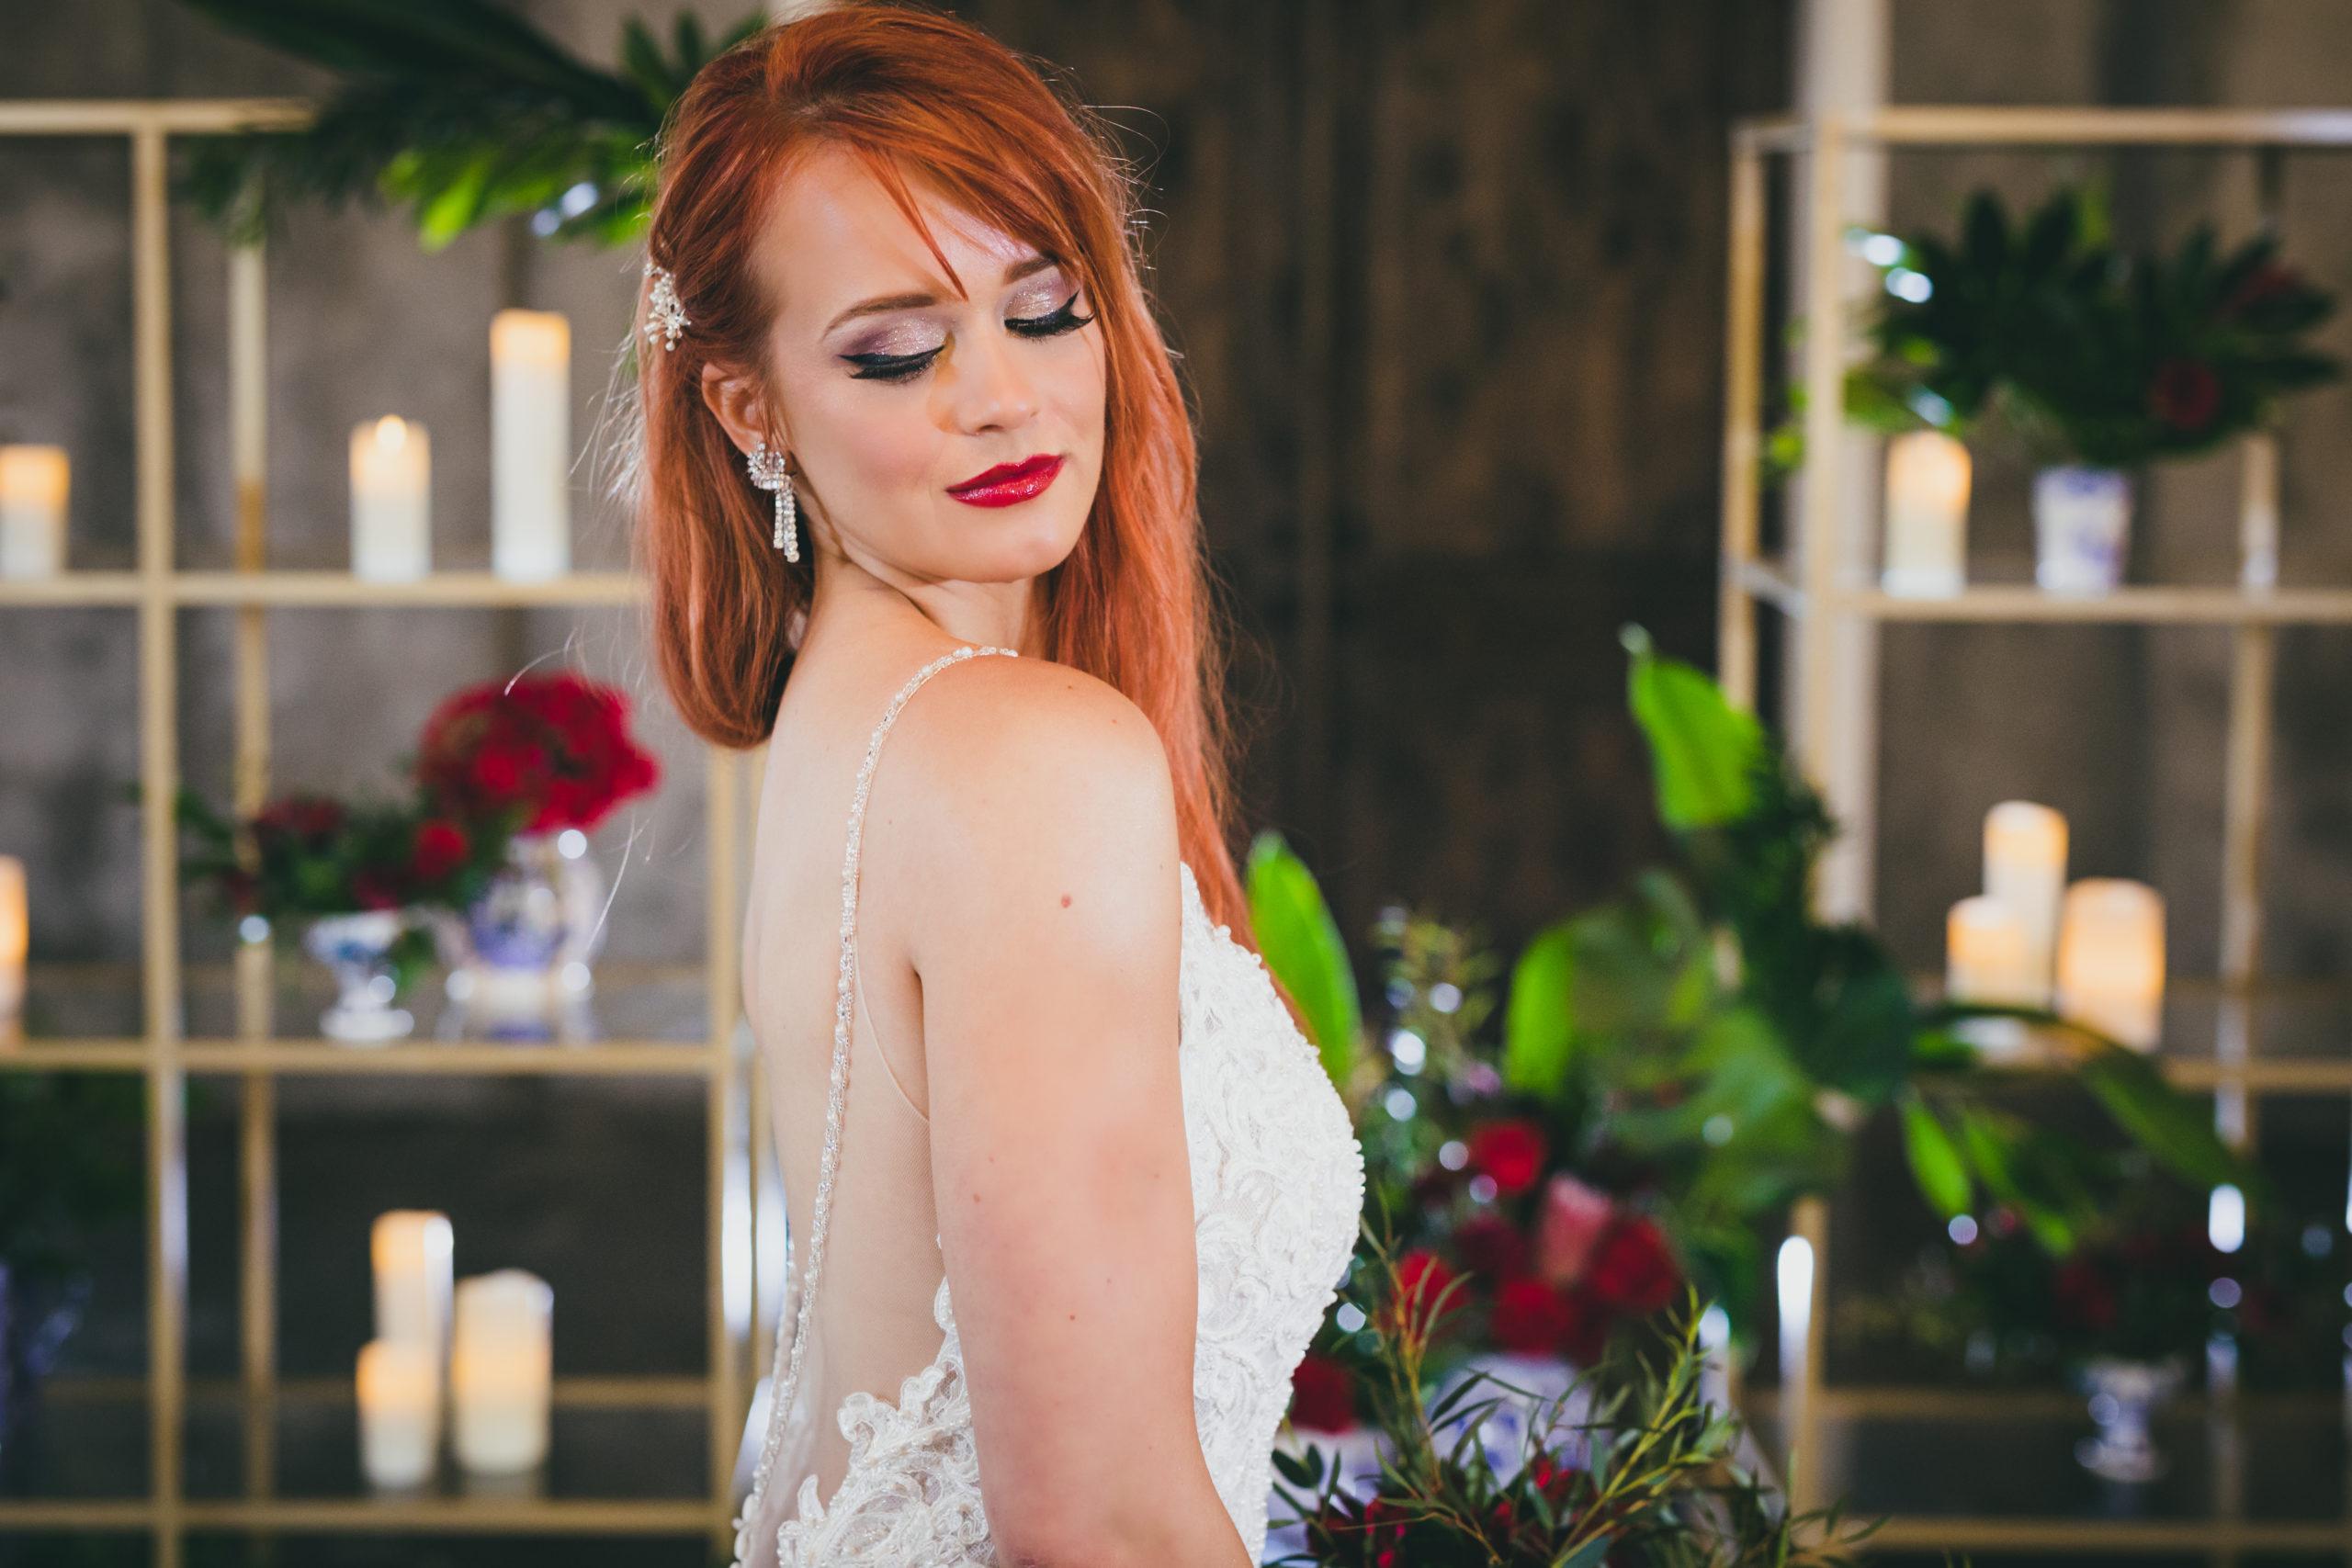 foxglove-styled-shoot-atlanta-wedding-photographers-lsc02307